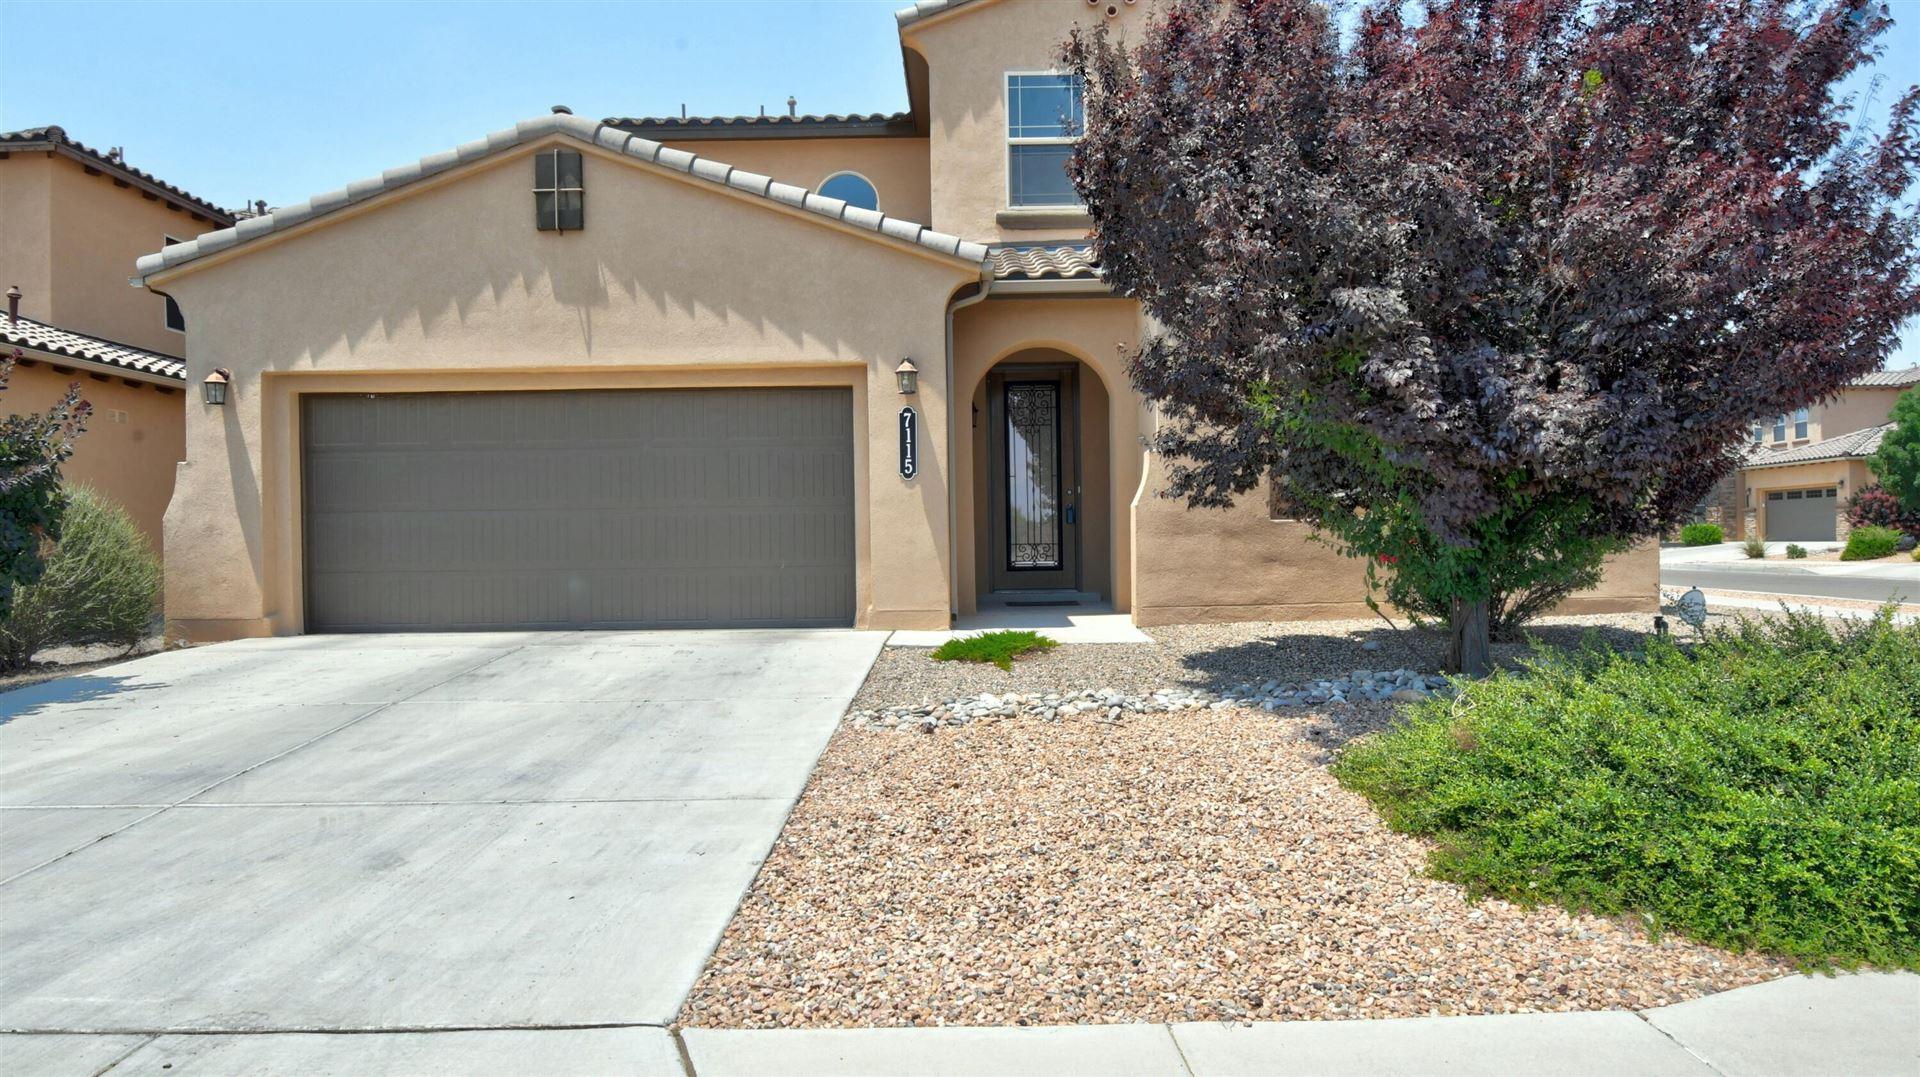 Photo of 7115 VISTA TERRAZA Drive NW, Albuquerque, NM 87120 (MLS # 994502)